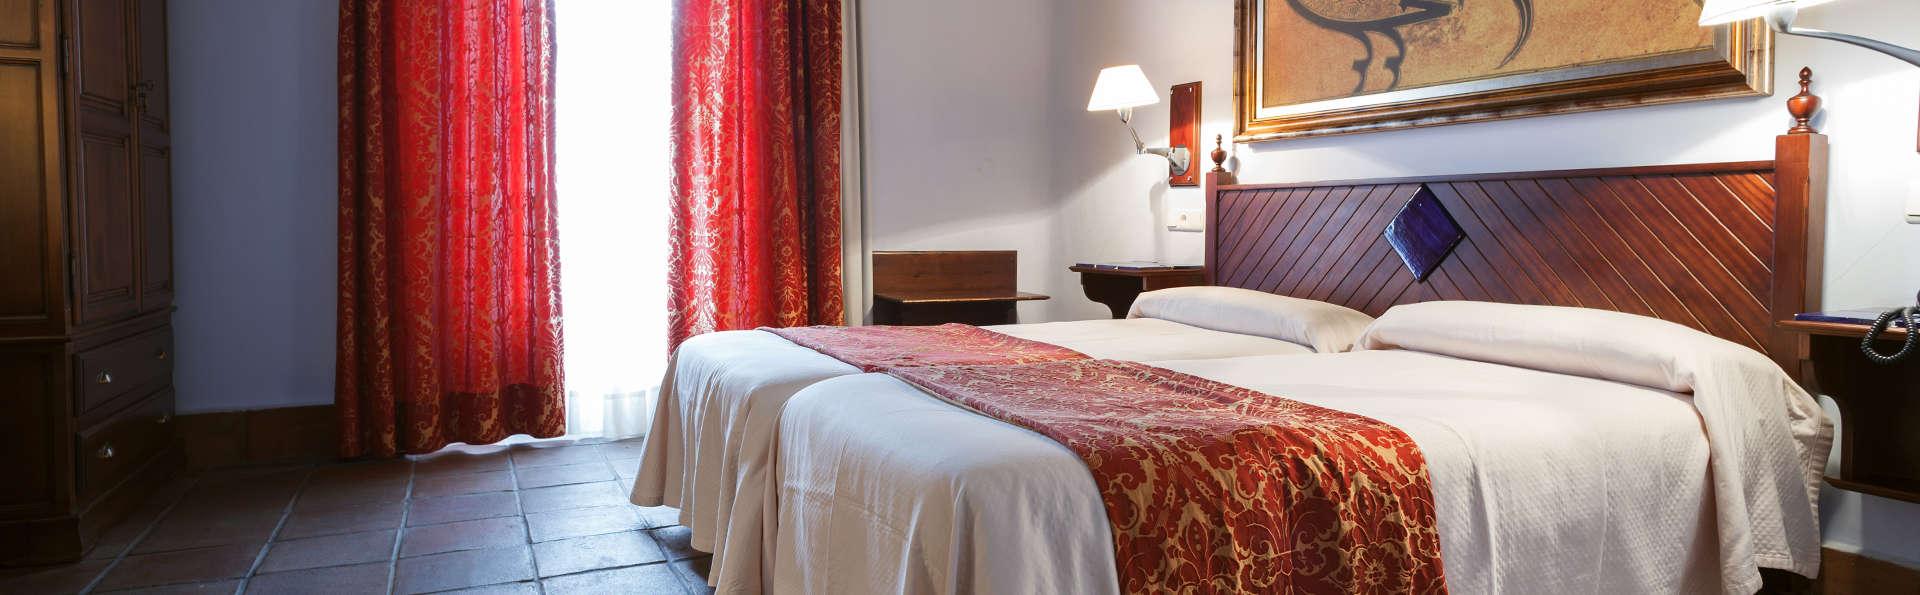 Casa Palacio Pilar del Toro - EDIT_Room2.jpg